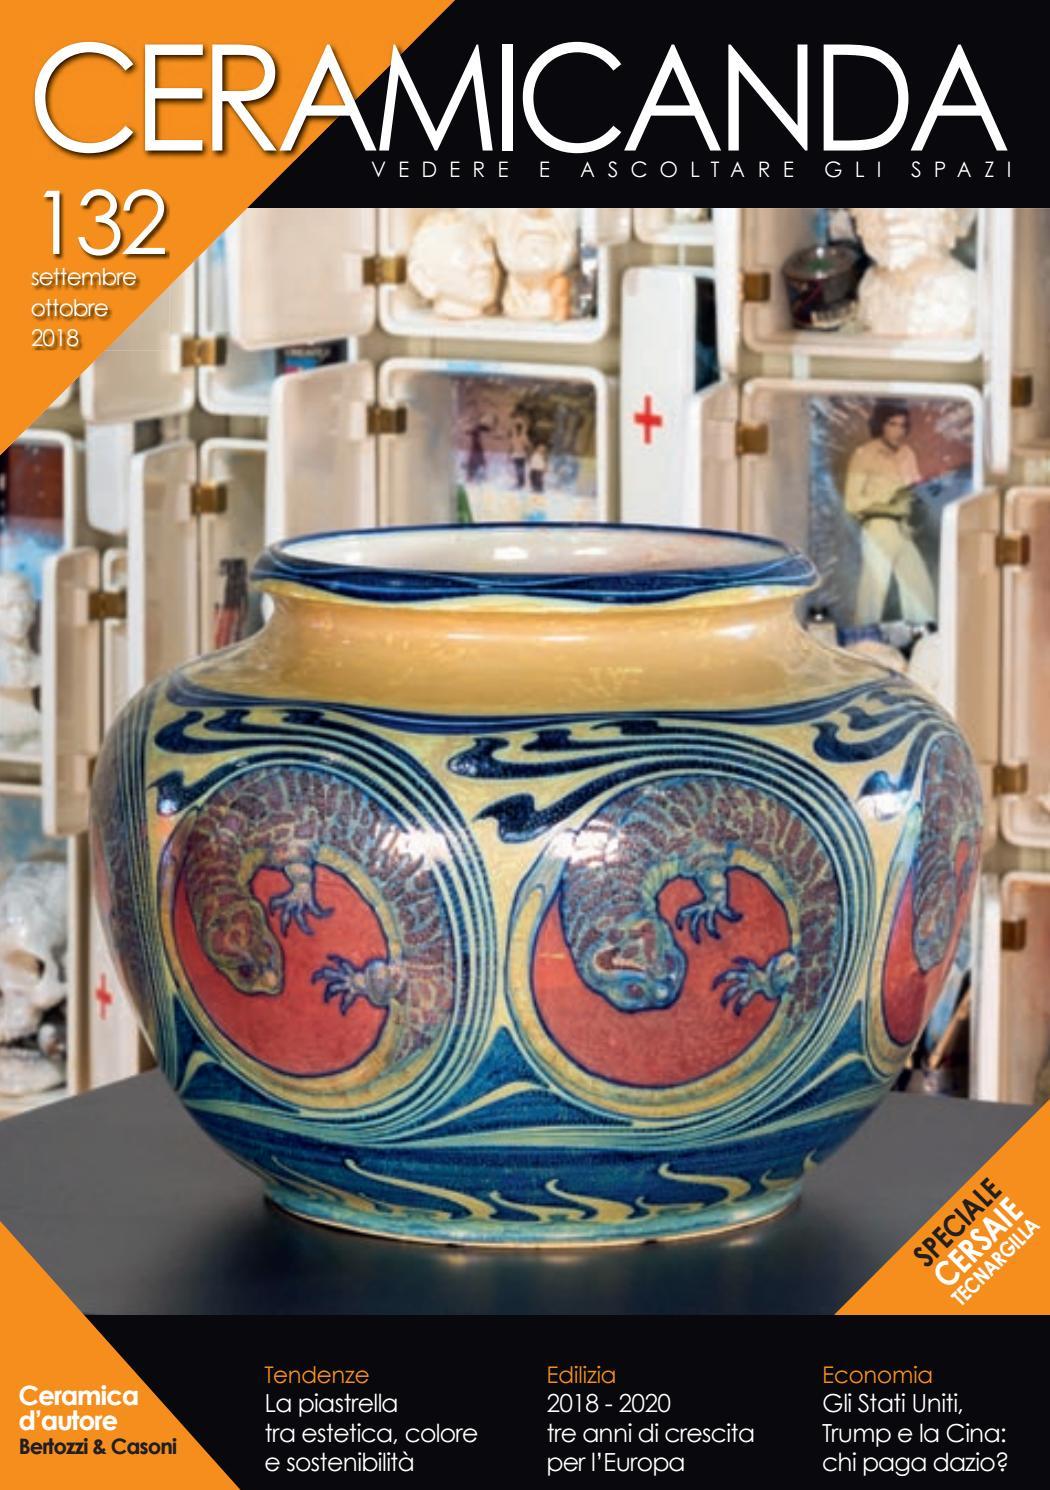 Cersaie 2020 Calendario.Ceramicanda N 132 By Ceramicanda Issuu